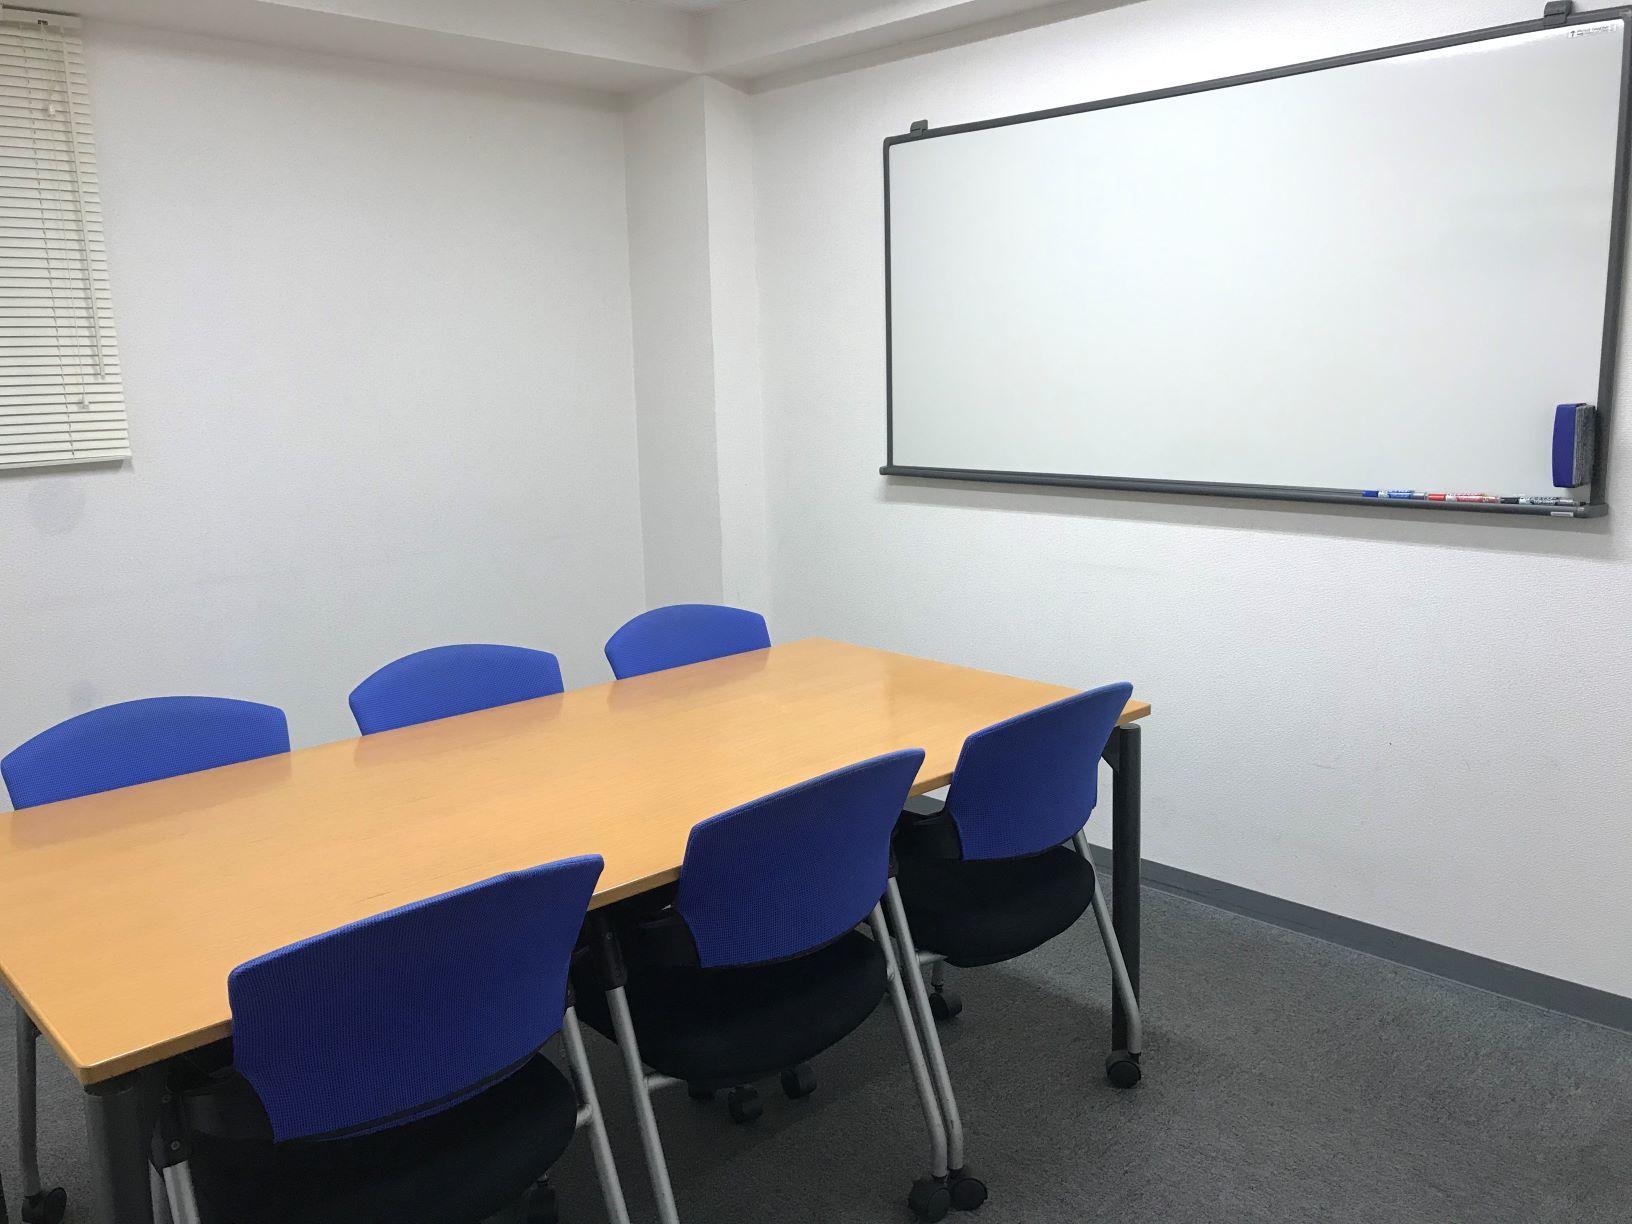 SOHOプラザ丸の内 貸会議室 中会議室1(6名様用)の室内の写真